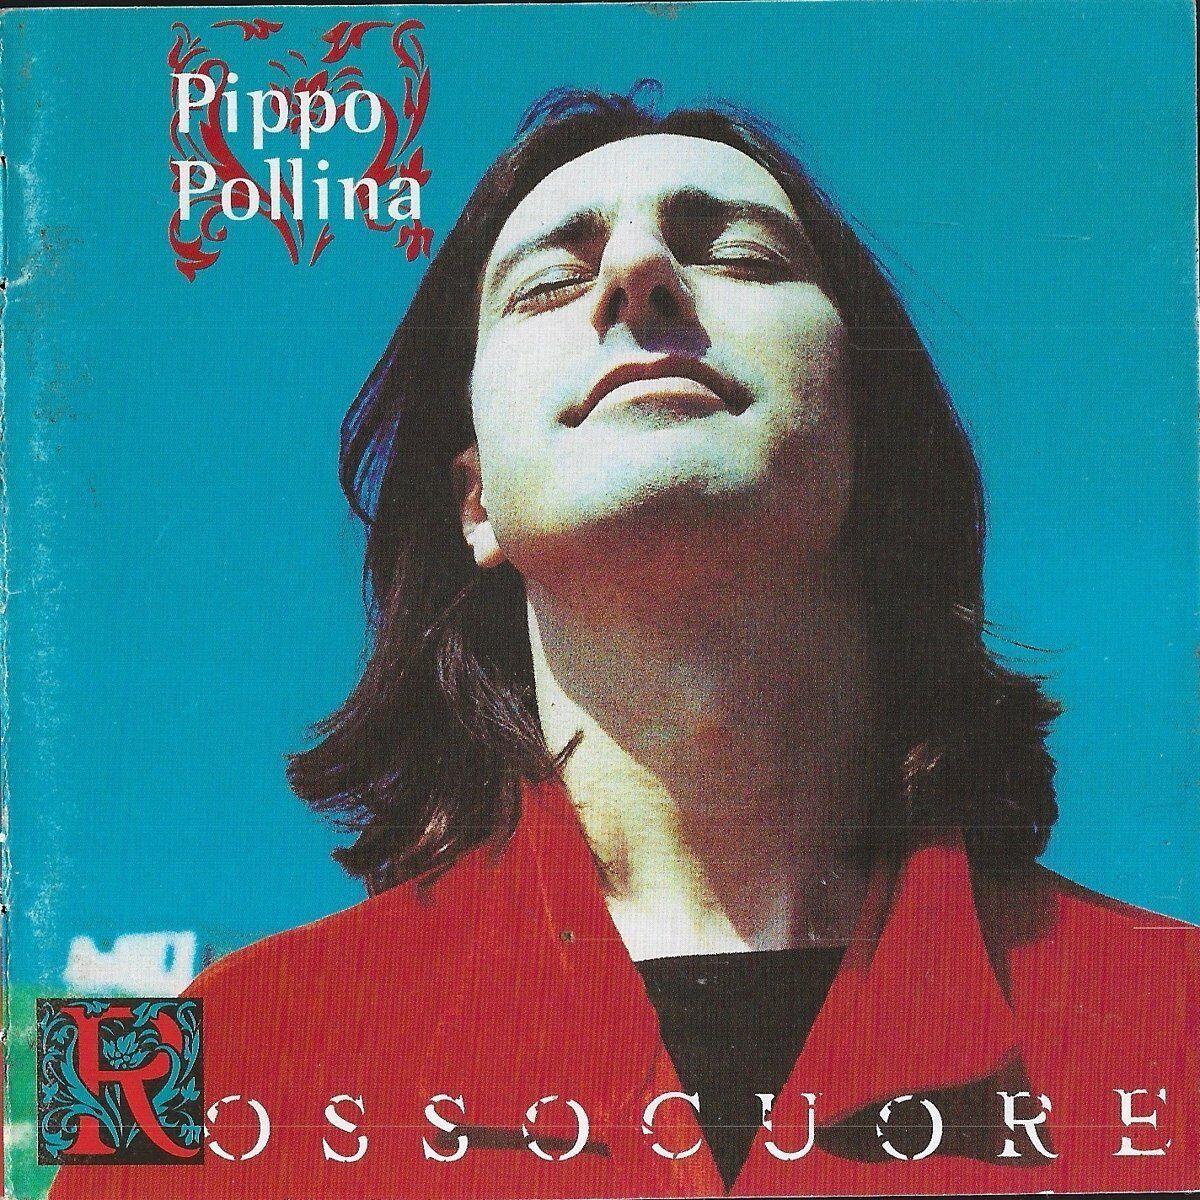 Pippo Pollina im radio-today - Shop